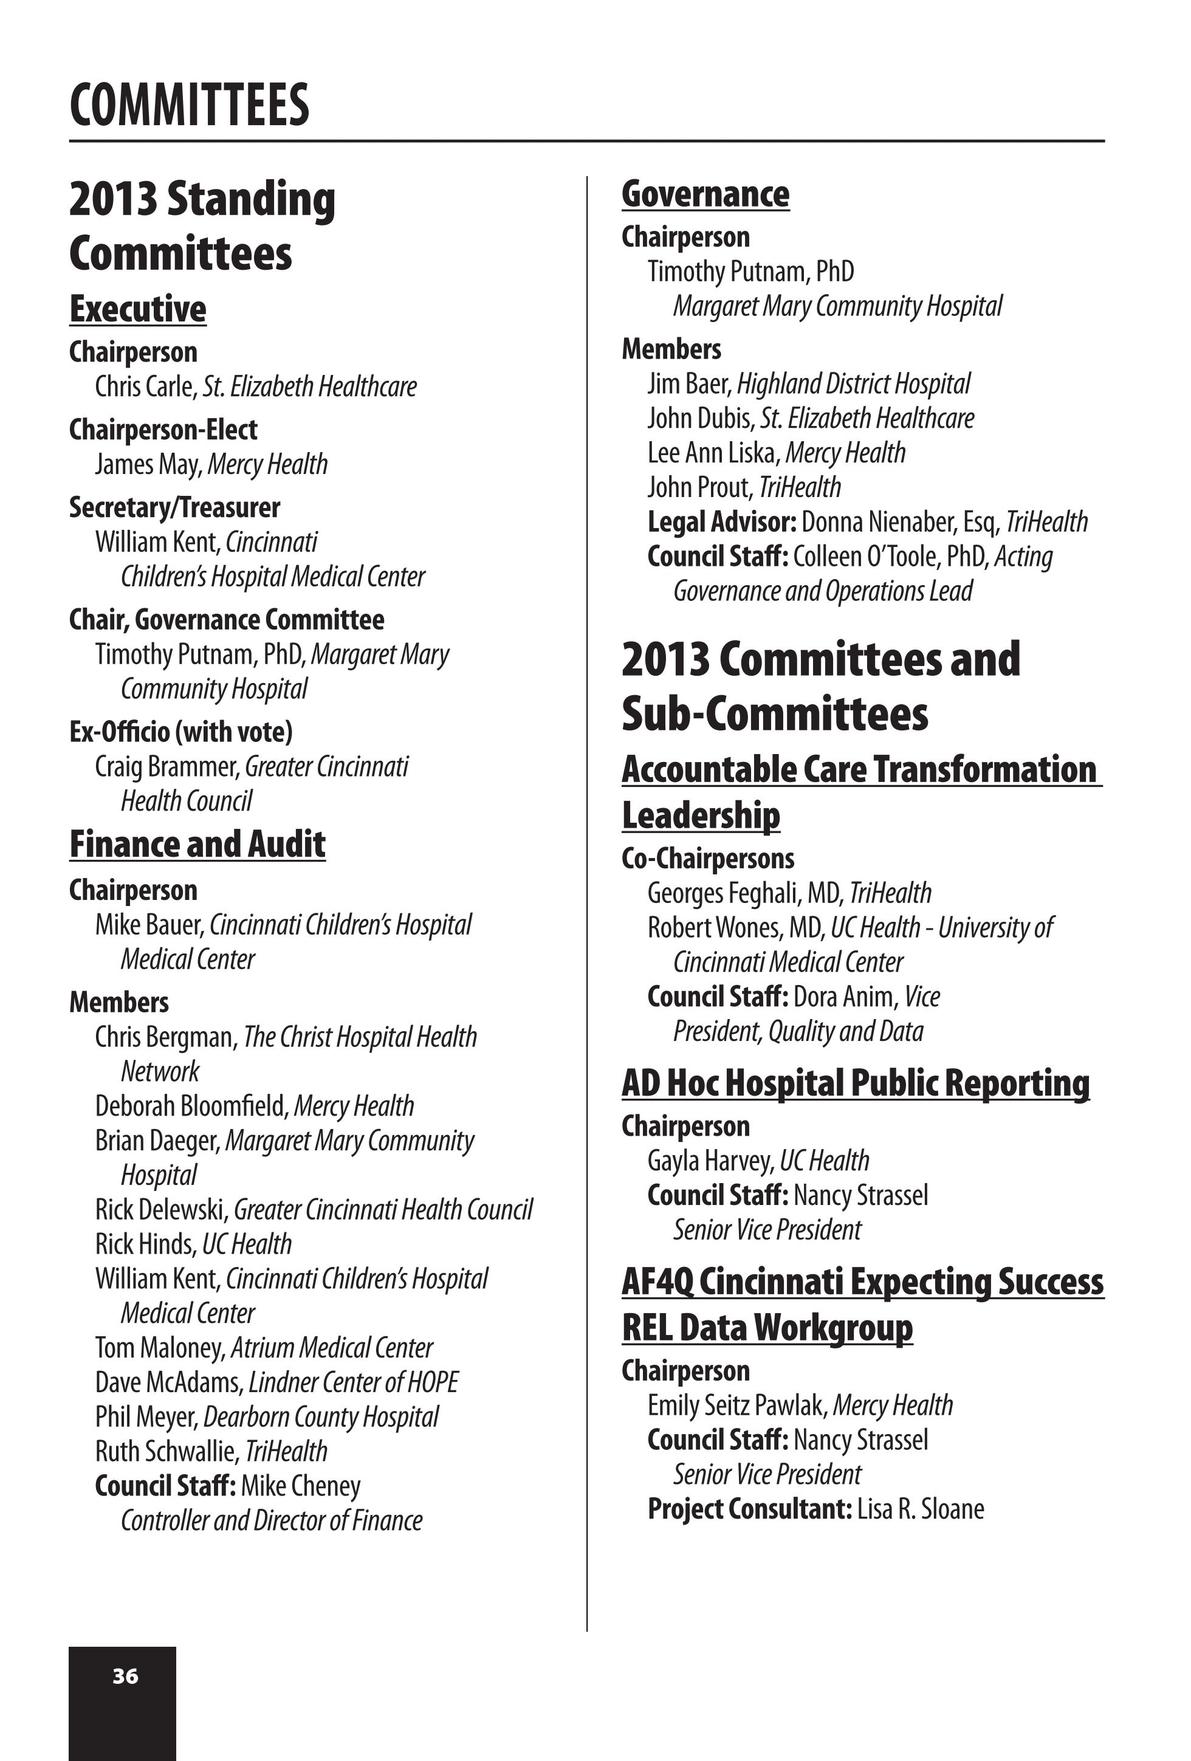 Greater Cincinnati Health Council 2013 Membership Directory